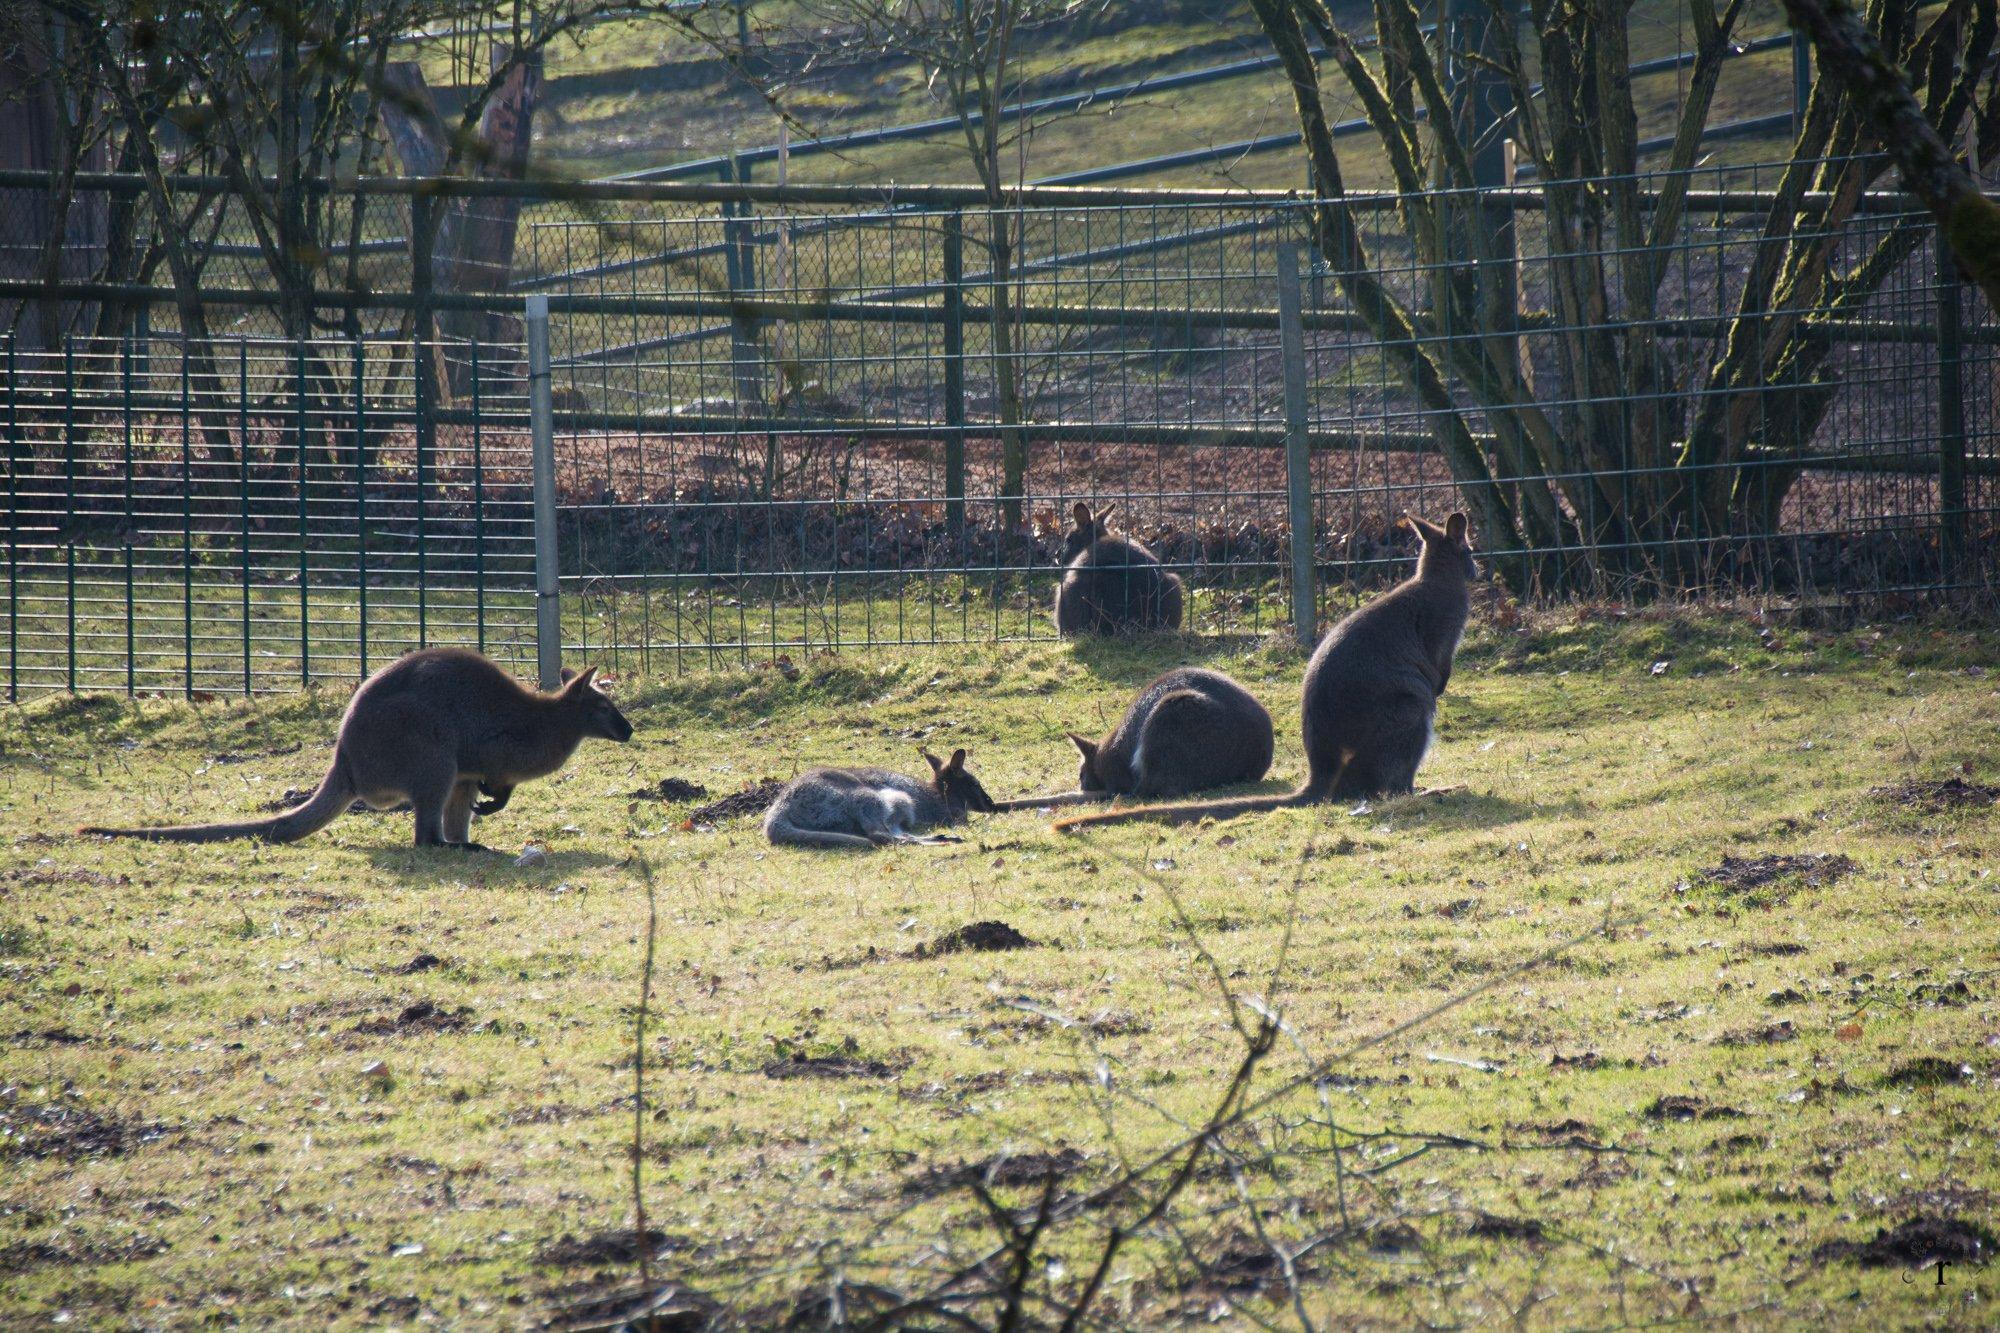 Neunkircher Zoo - Känguruh